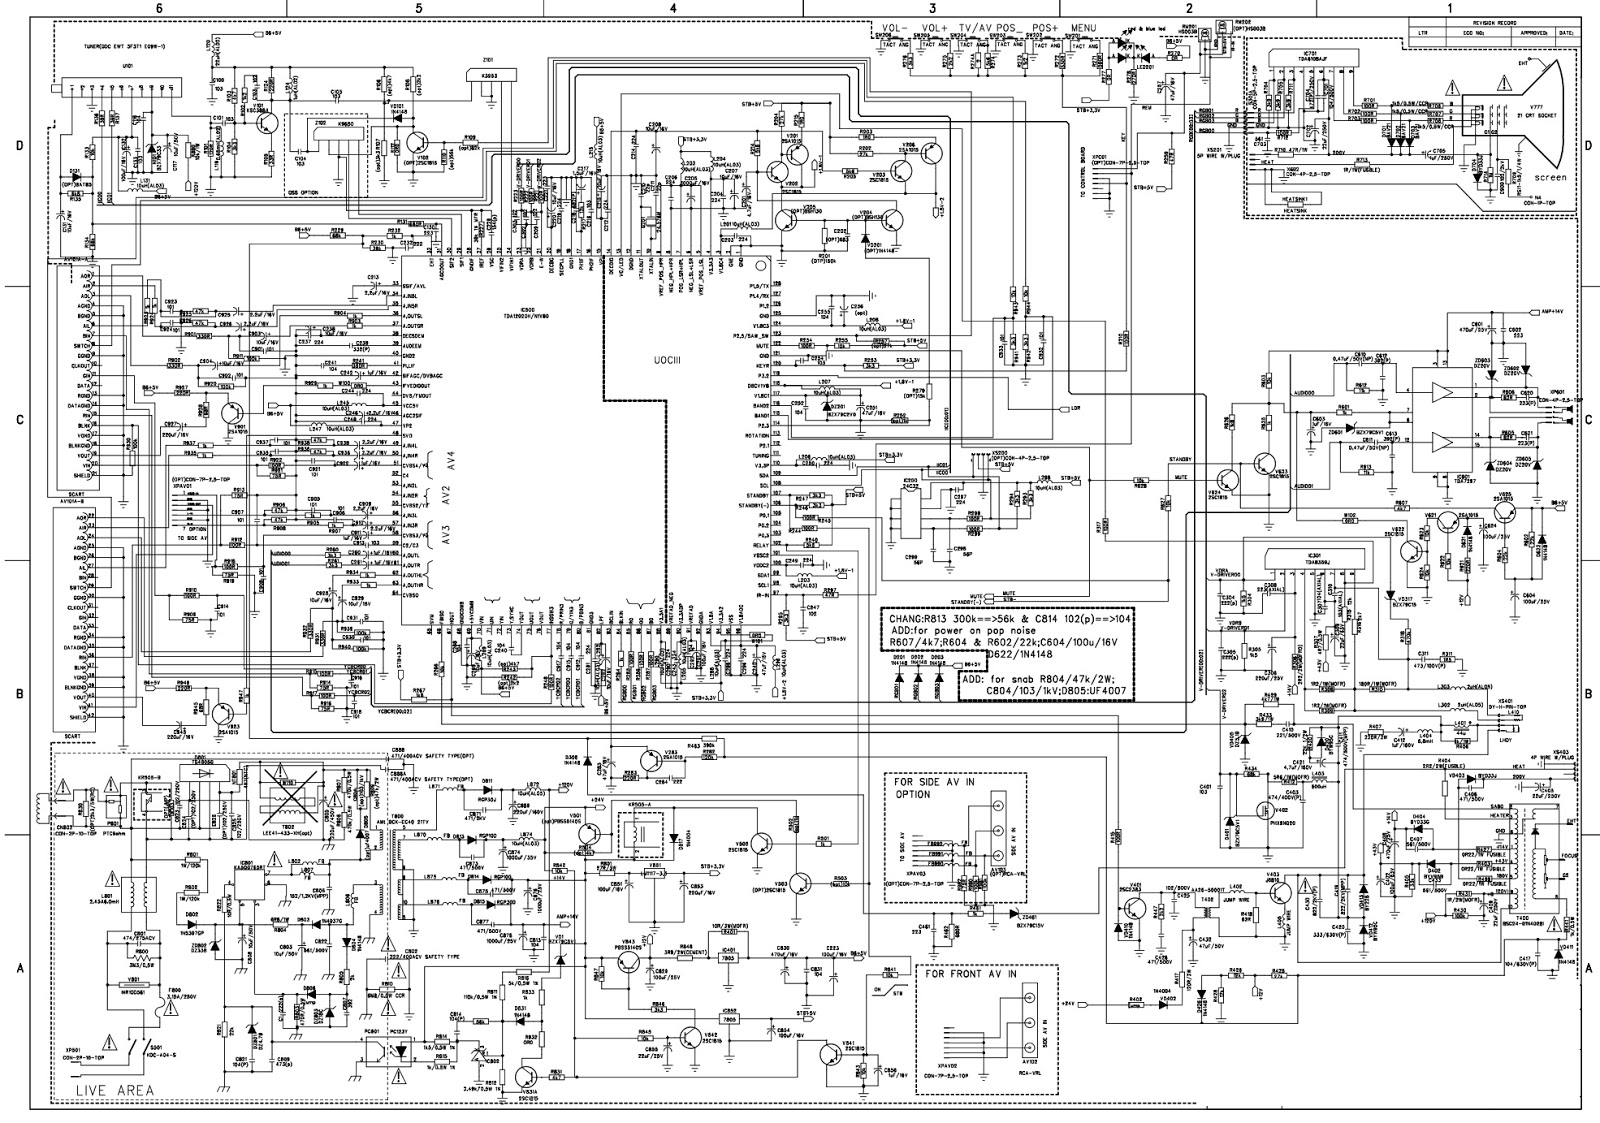 Tv Tuner Card Circuit Diagram Pollak 12 705 Wiring 2 Videocon 21 Inch Ctvs Diagrams  Tda 12135 And